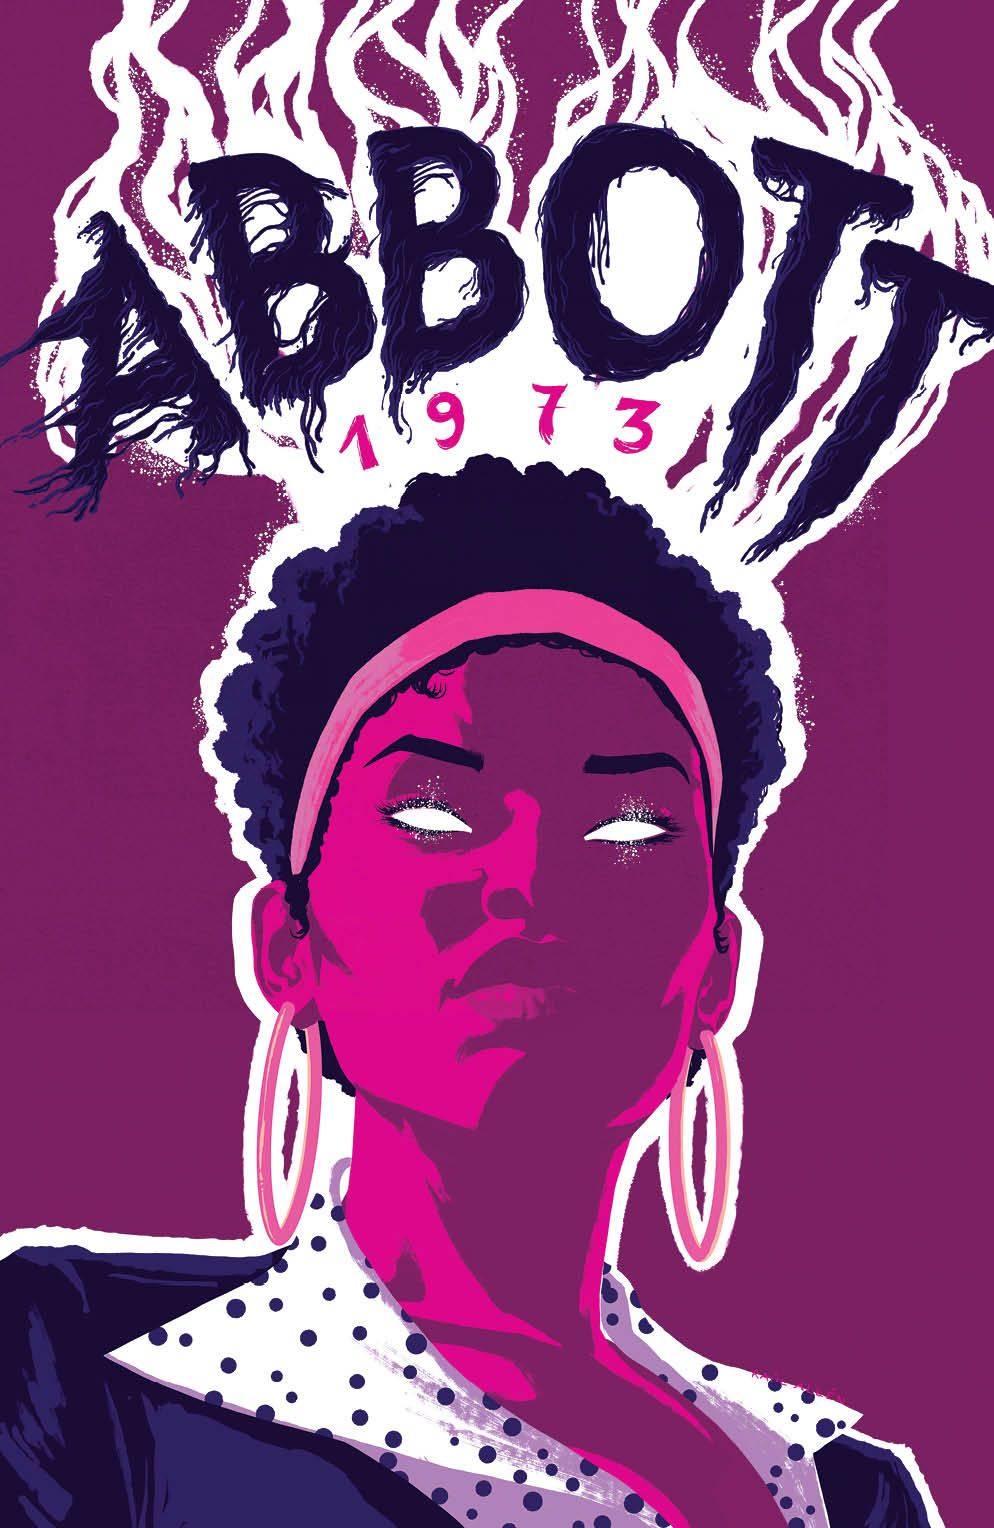 Abbott_1973_005_Cover_B_Variant ComicList Previews: ABBOTT 1973 #5 (OF 5)